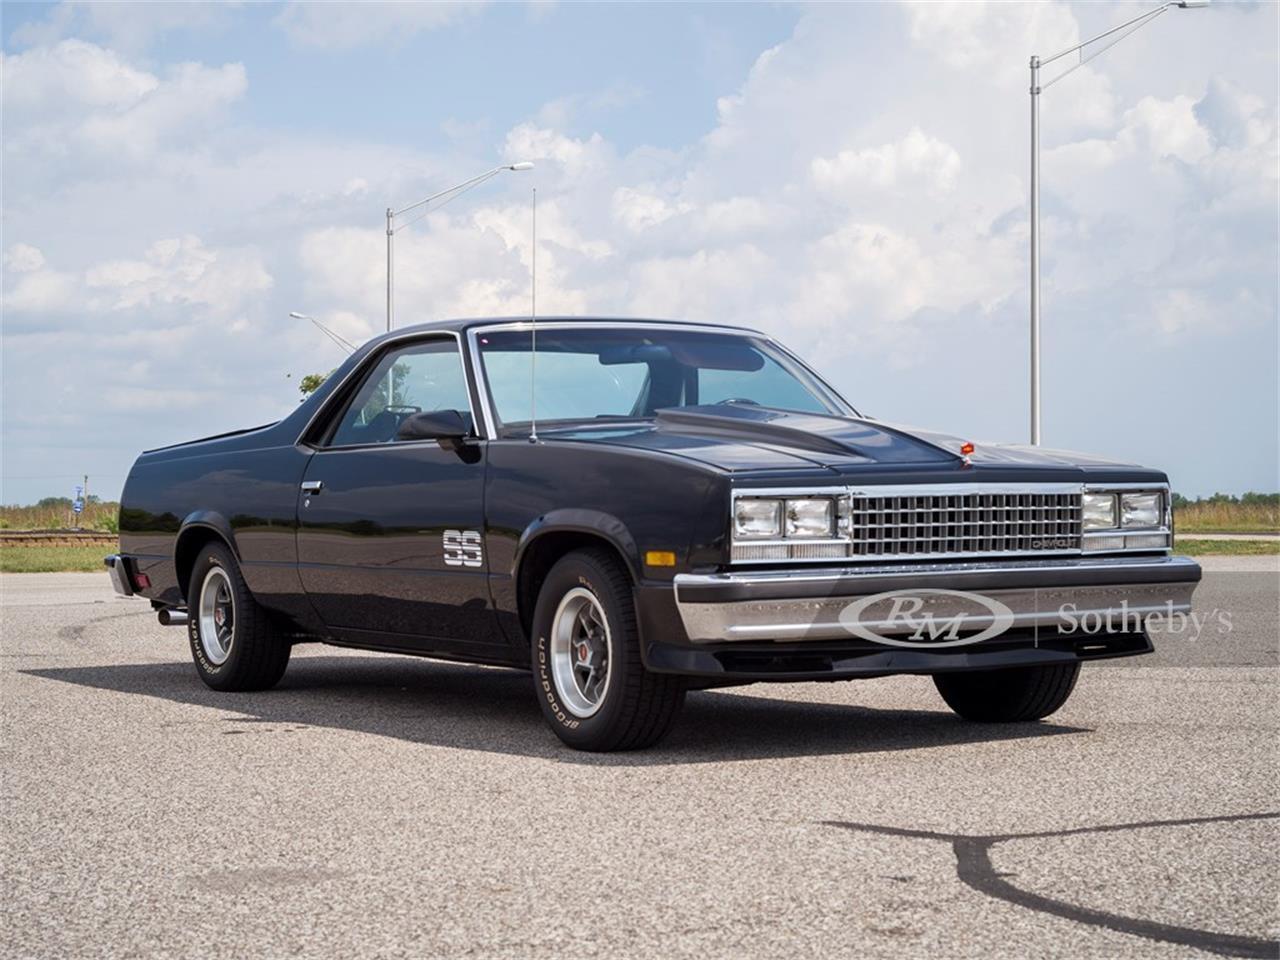 1987 Chevrolet El Camino SS (CC-1419165) for sale in Hershey, Pennsylvania